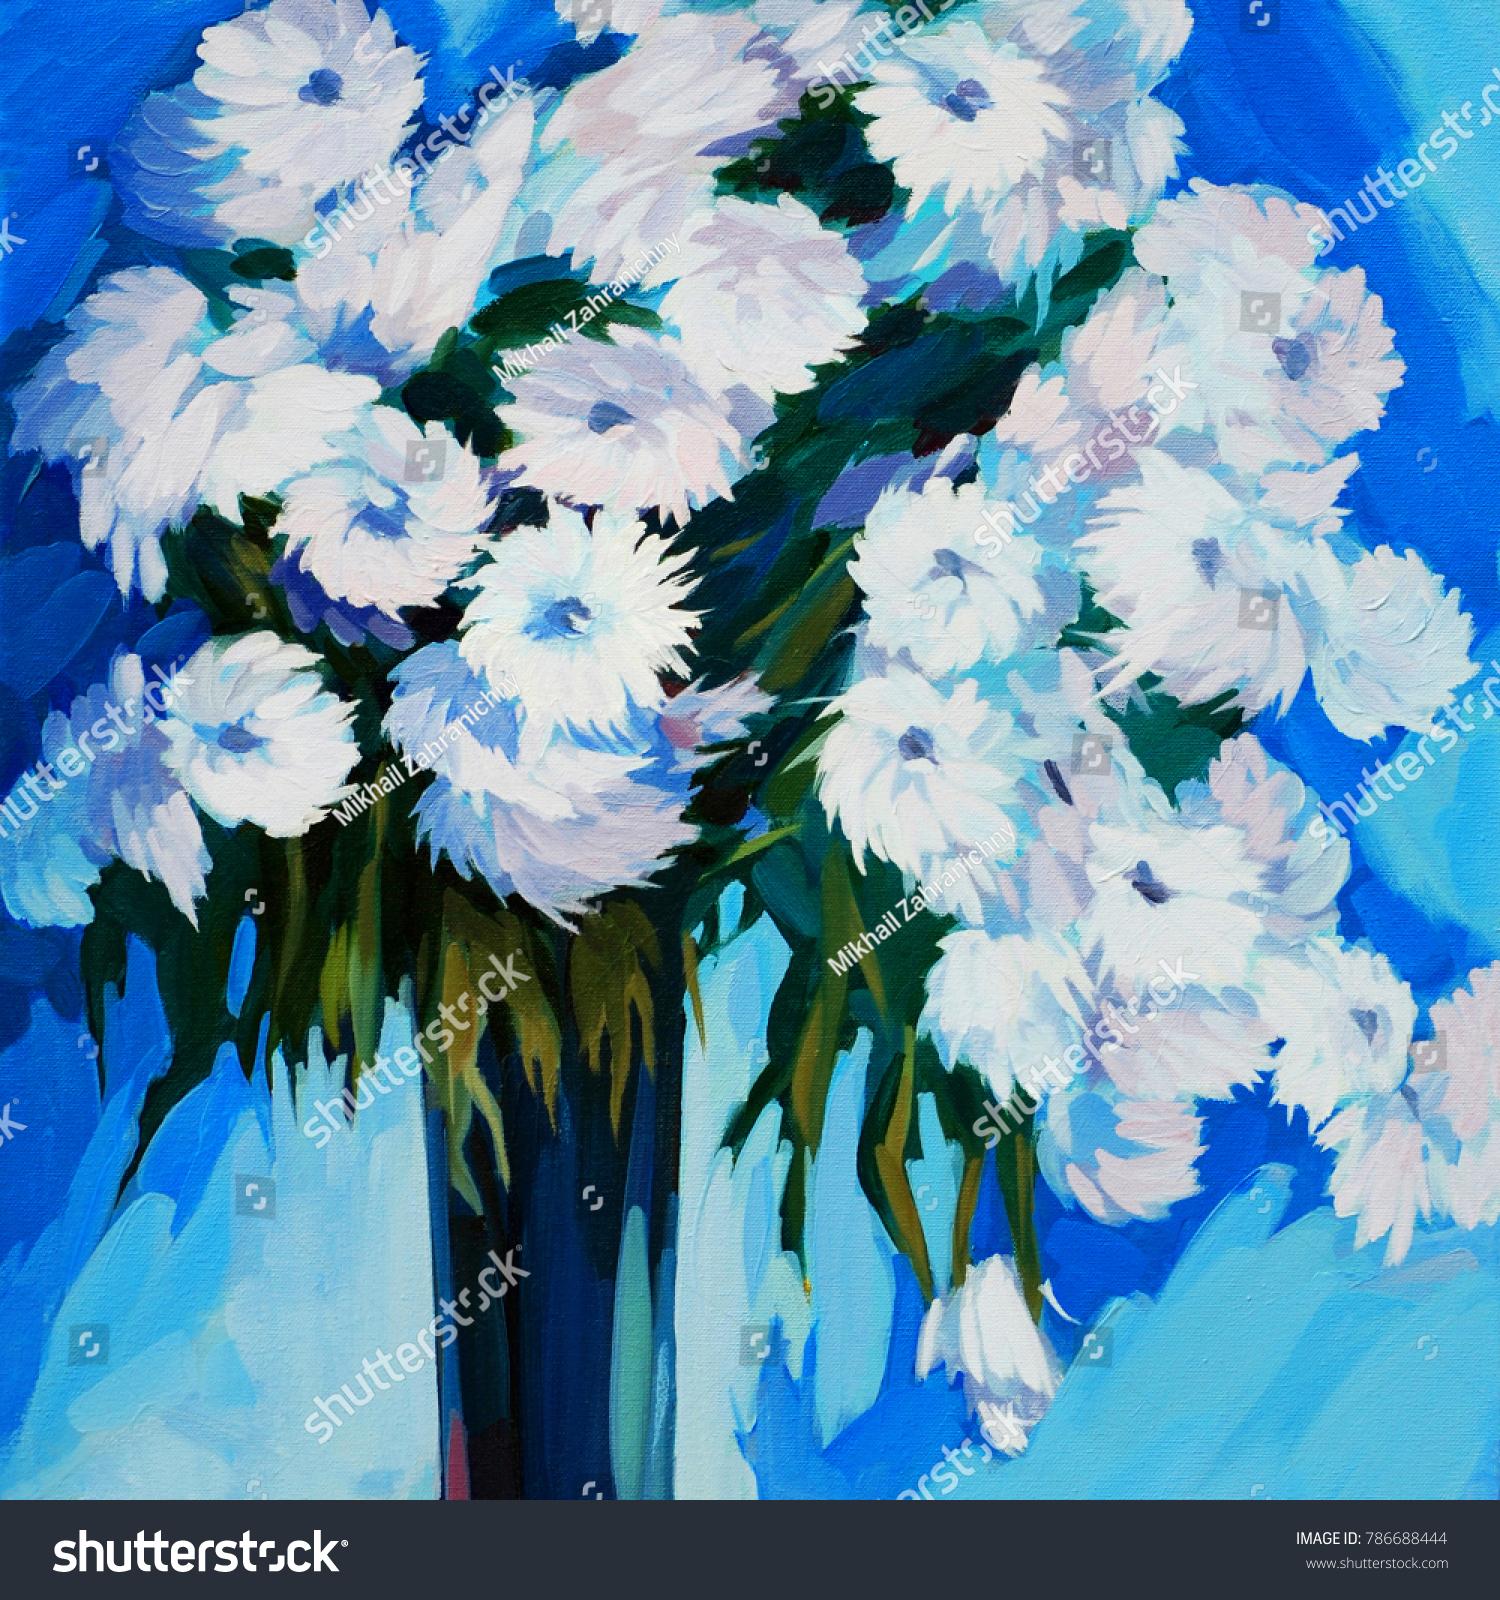 White flowers vase oil painting on stock illustration 786688444 white flowers in a vase oil painting on canvas illustration floridaeventfo Images